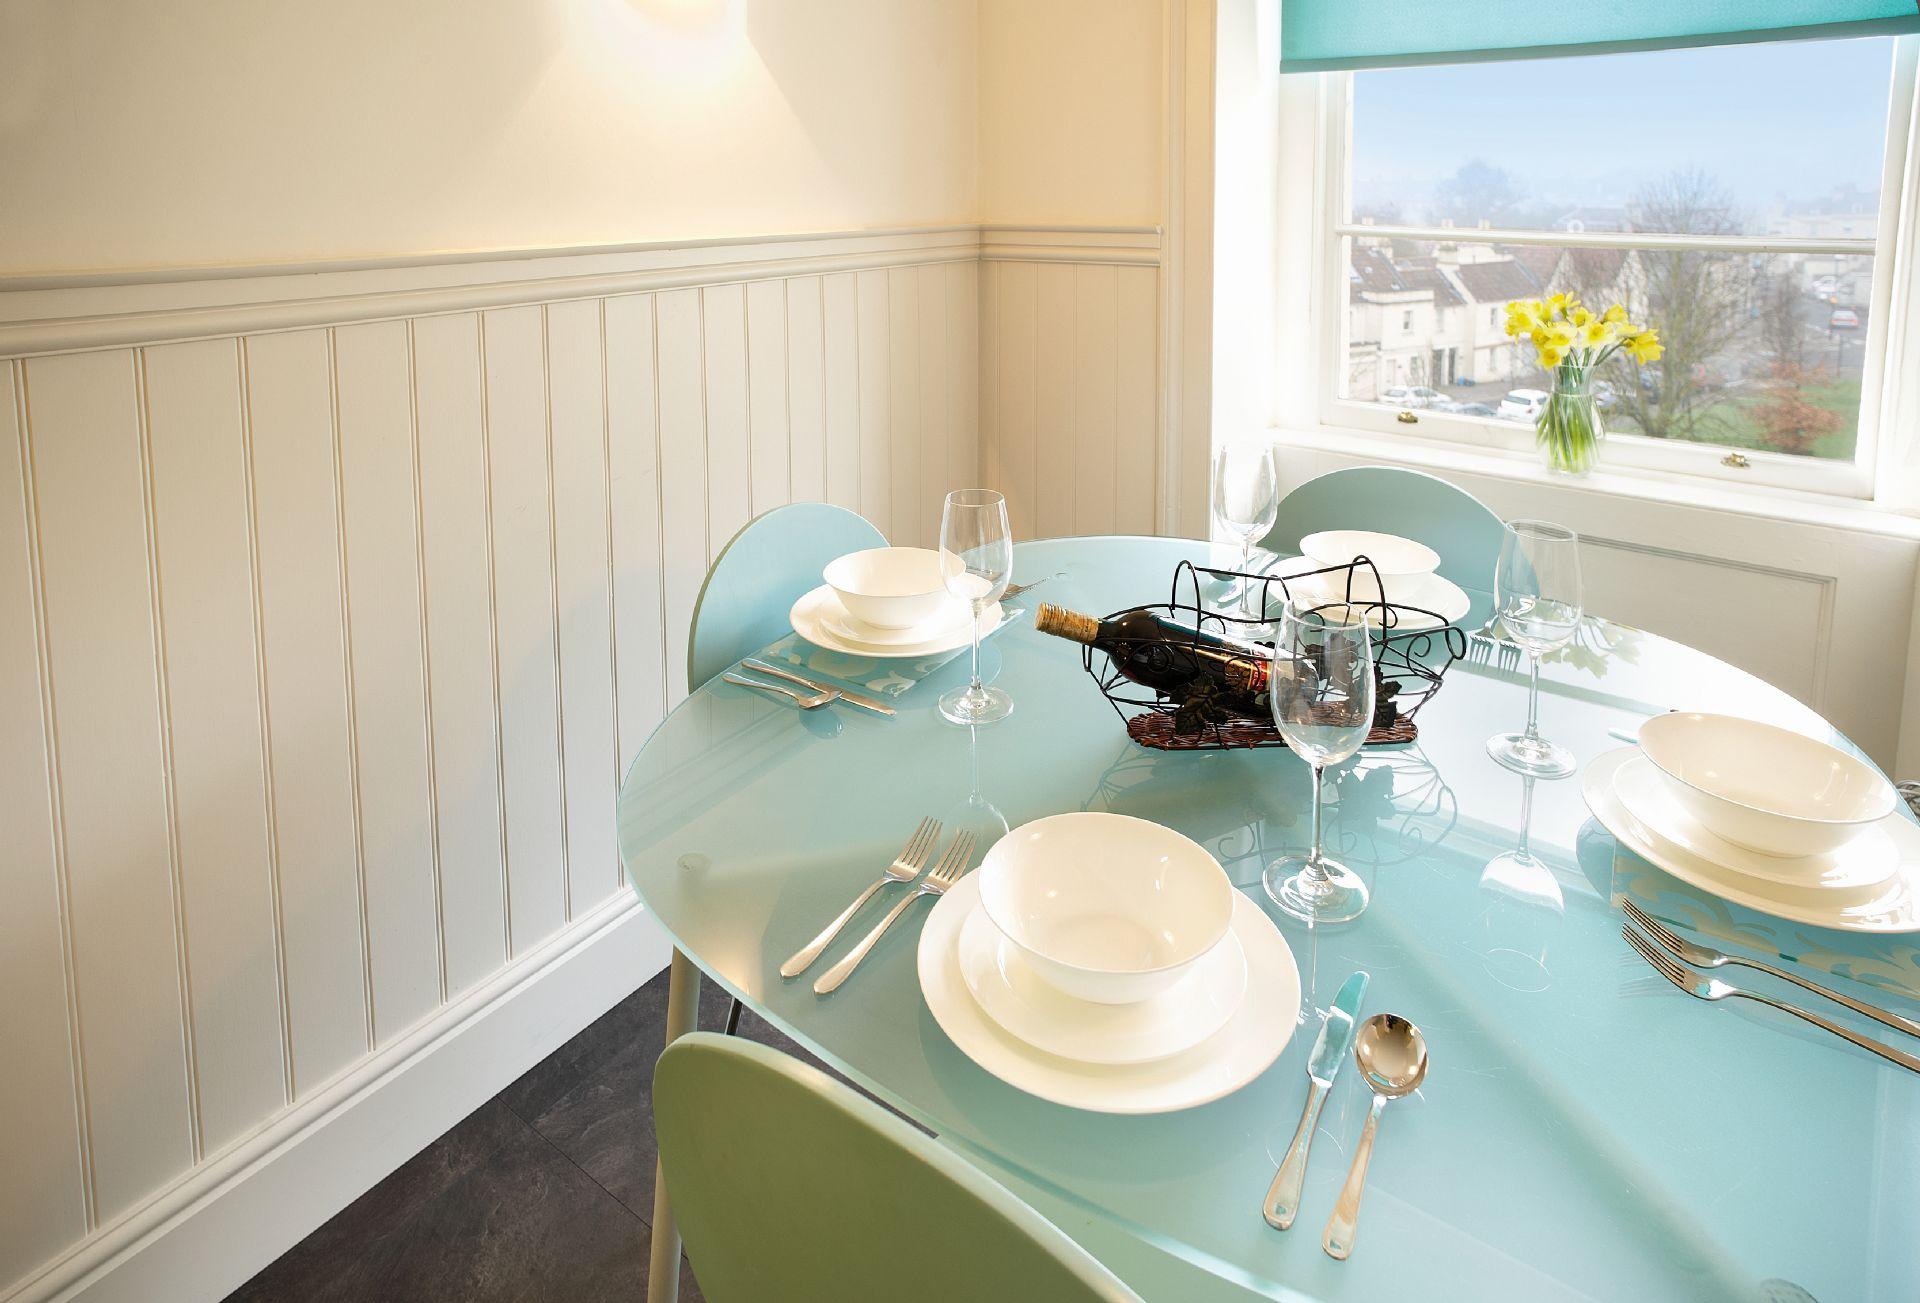 Second floor: Kitchen dining area